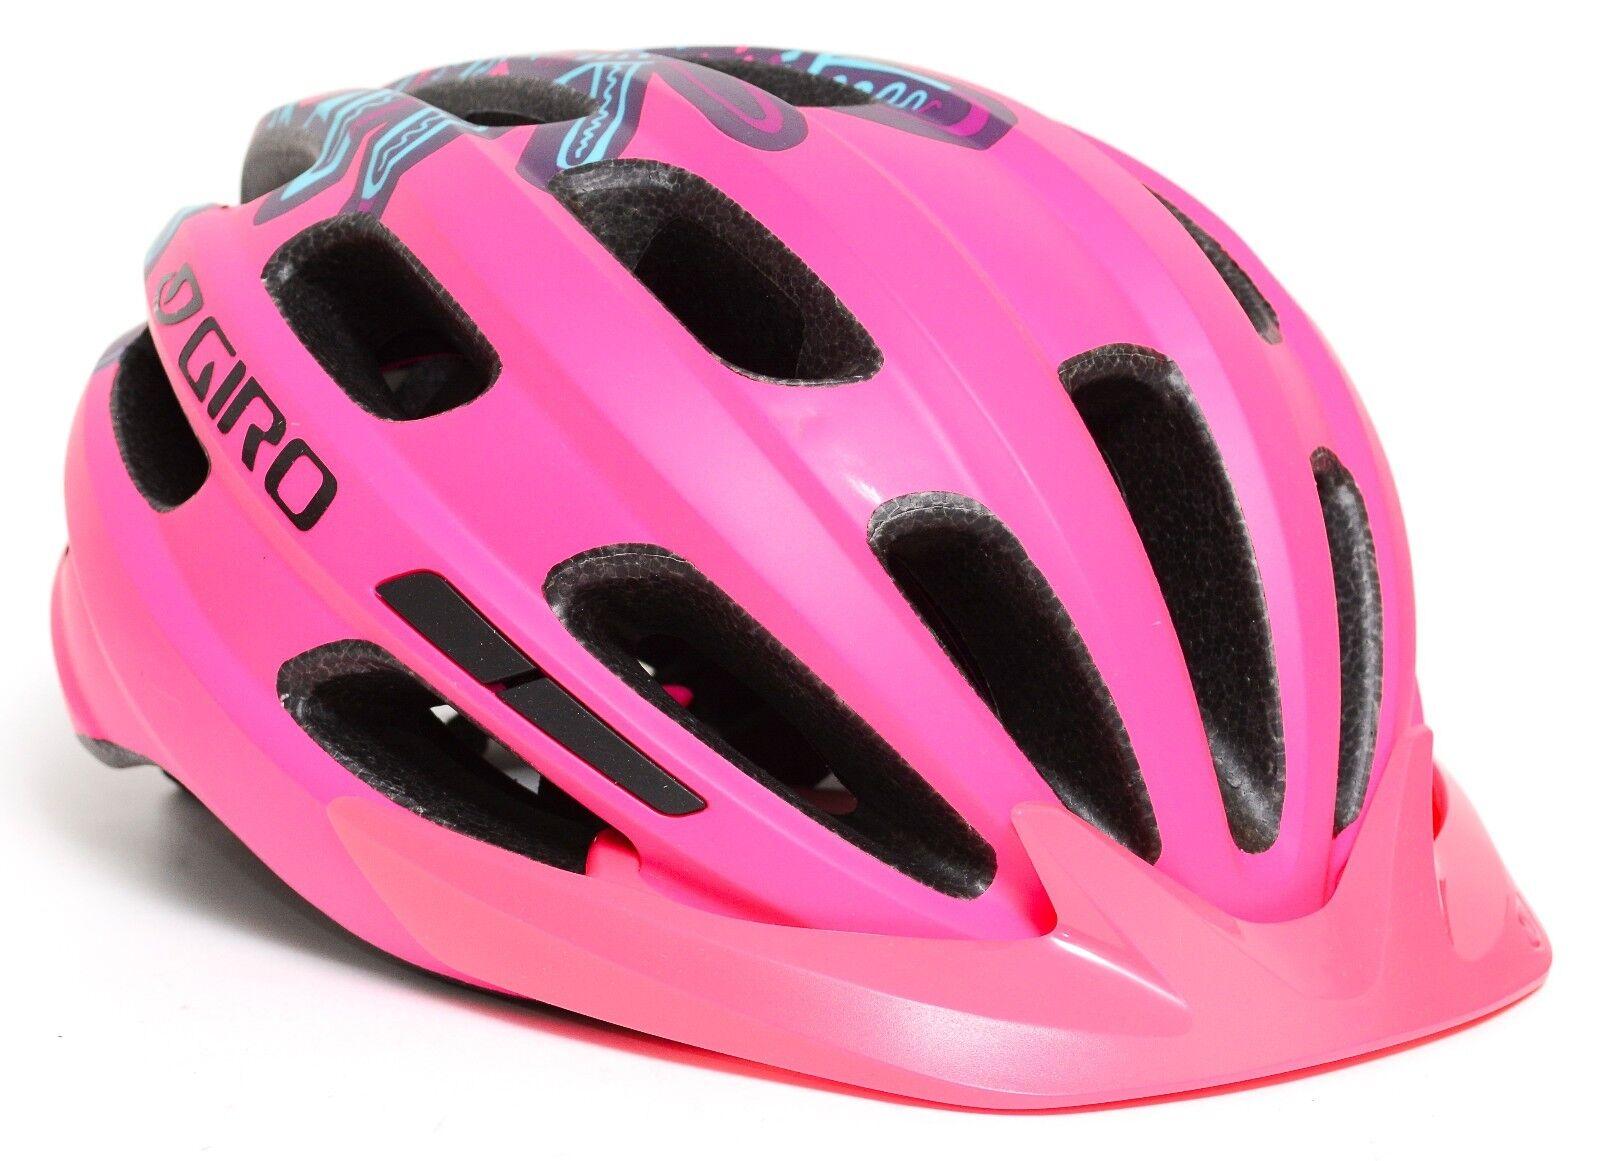 Giro Youth Hale Cycling Bike Helmet Universal Fit 50-57cm Vi